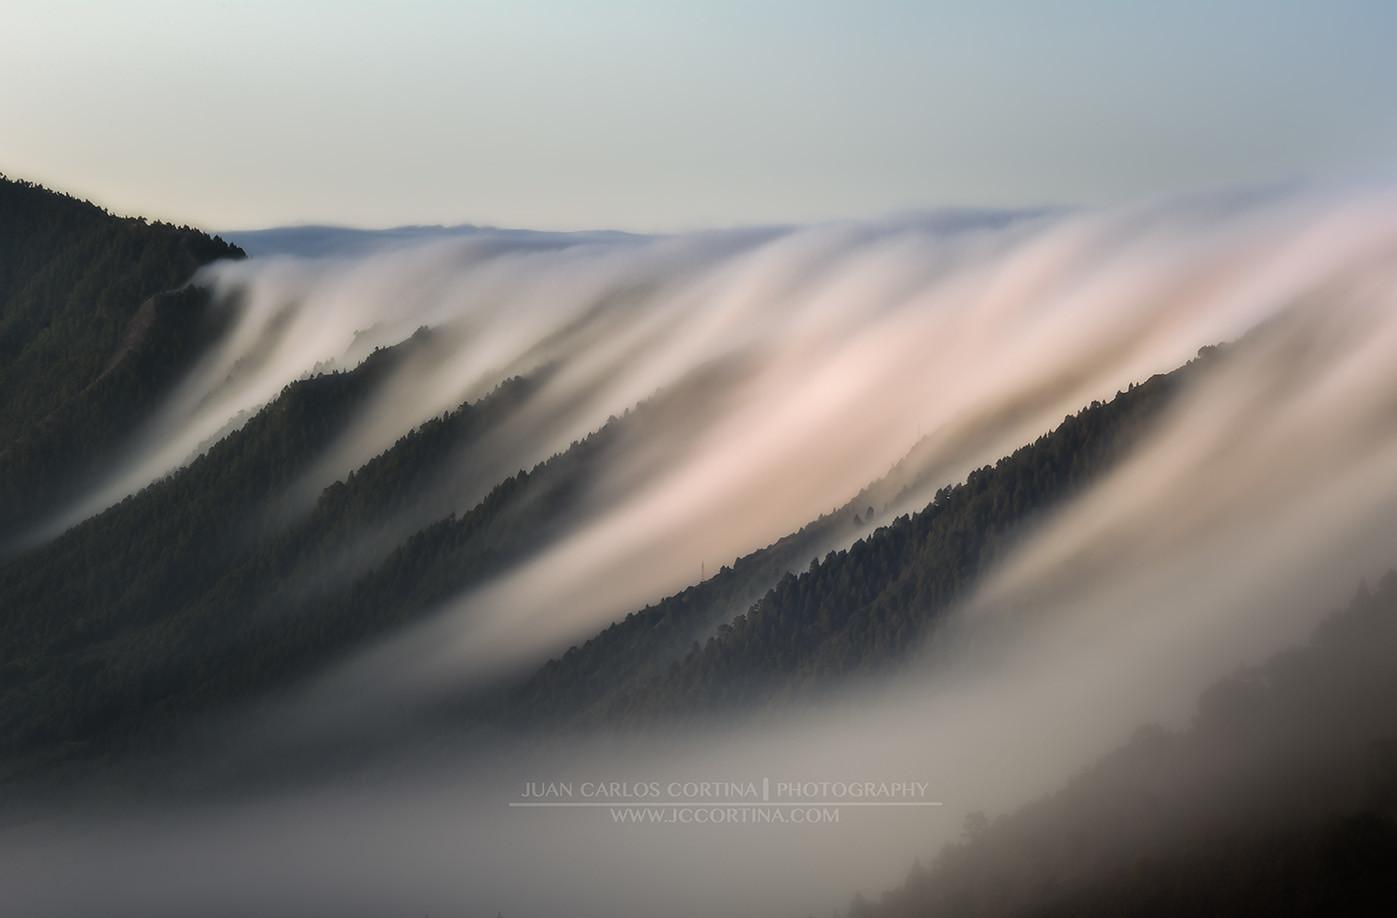 la cascada de nubes de La Palma